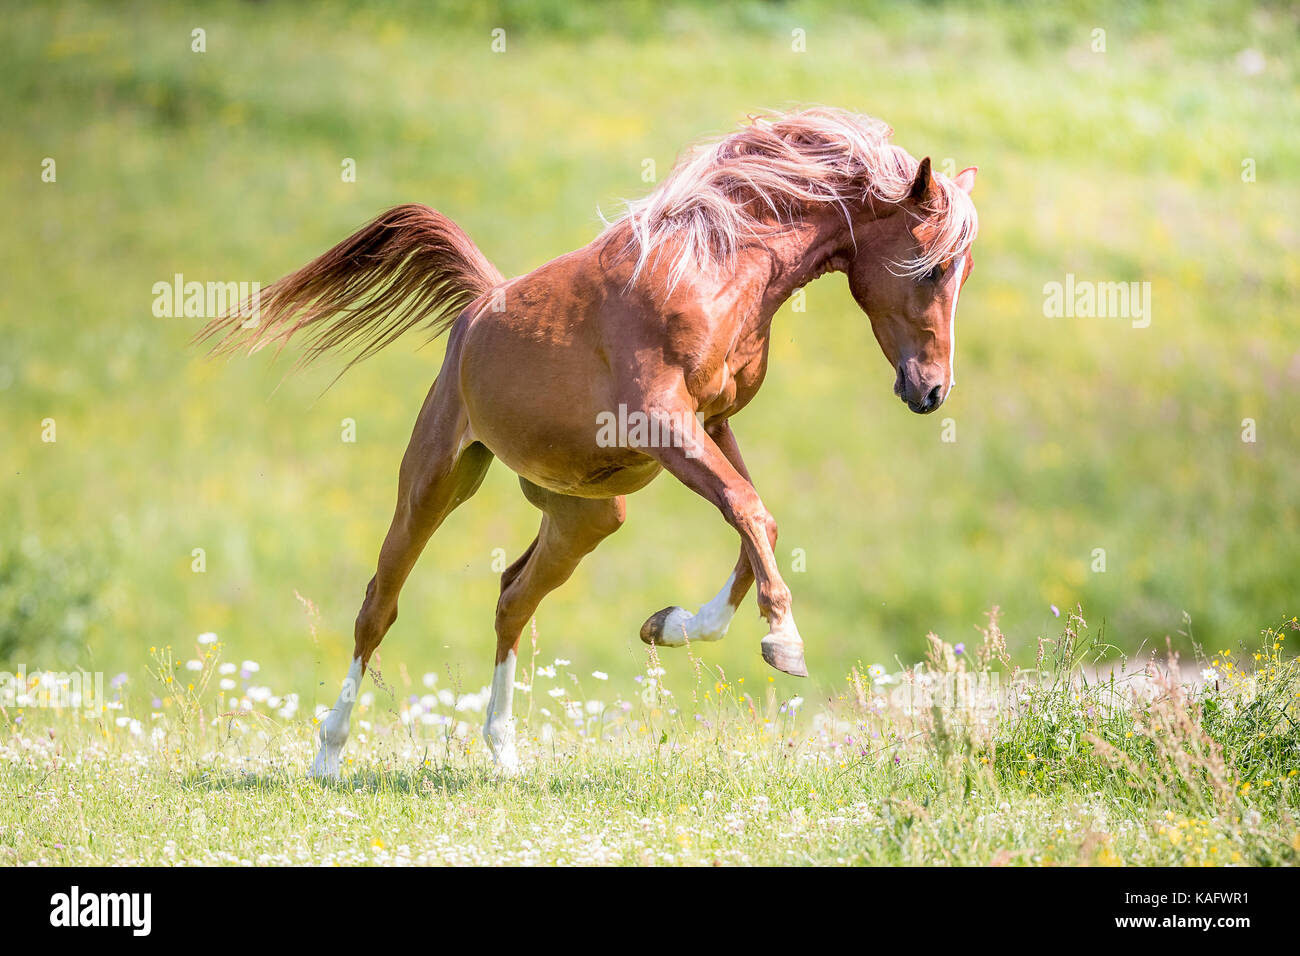 Arabian Horse. Juvenile chestnut stallion leaping on a pasture. Austria - Stock Image